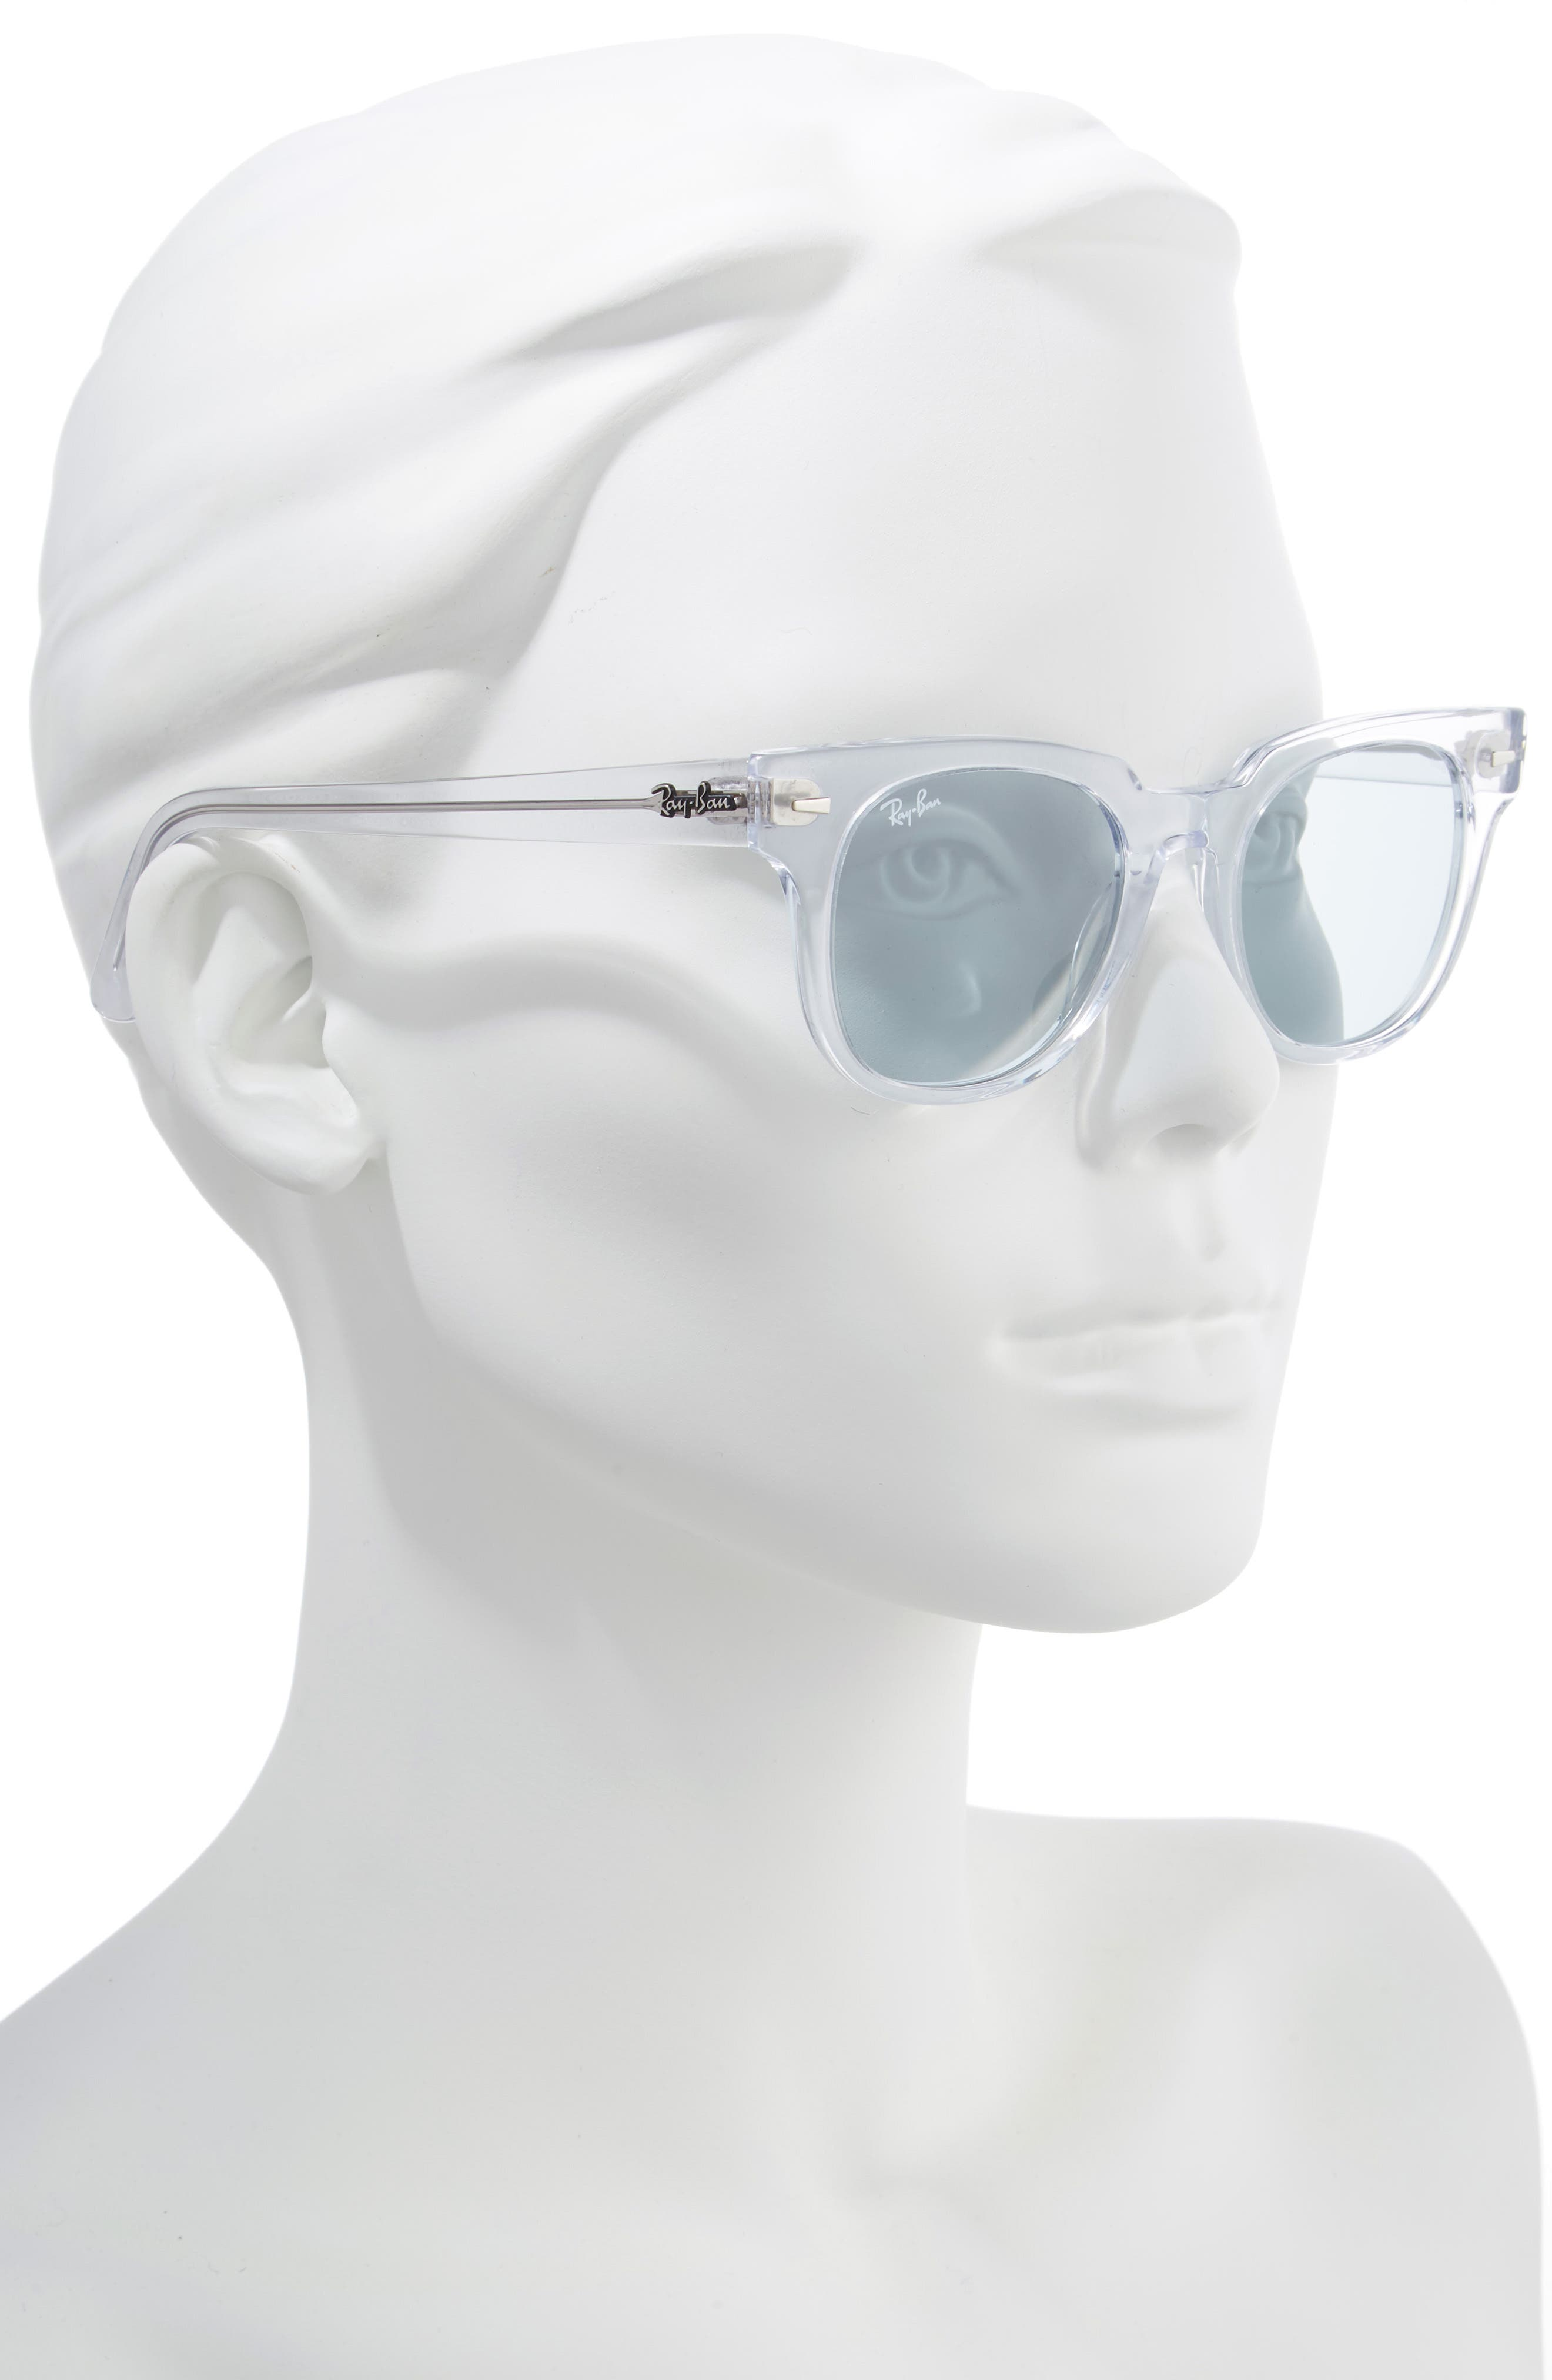 Meteor 50mm Polarized Wayfarer Sunglasses,                             Alternate thumbnail 2, color,                             CRYSTAL/ BLUE SOLID